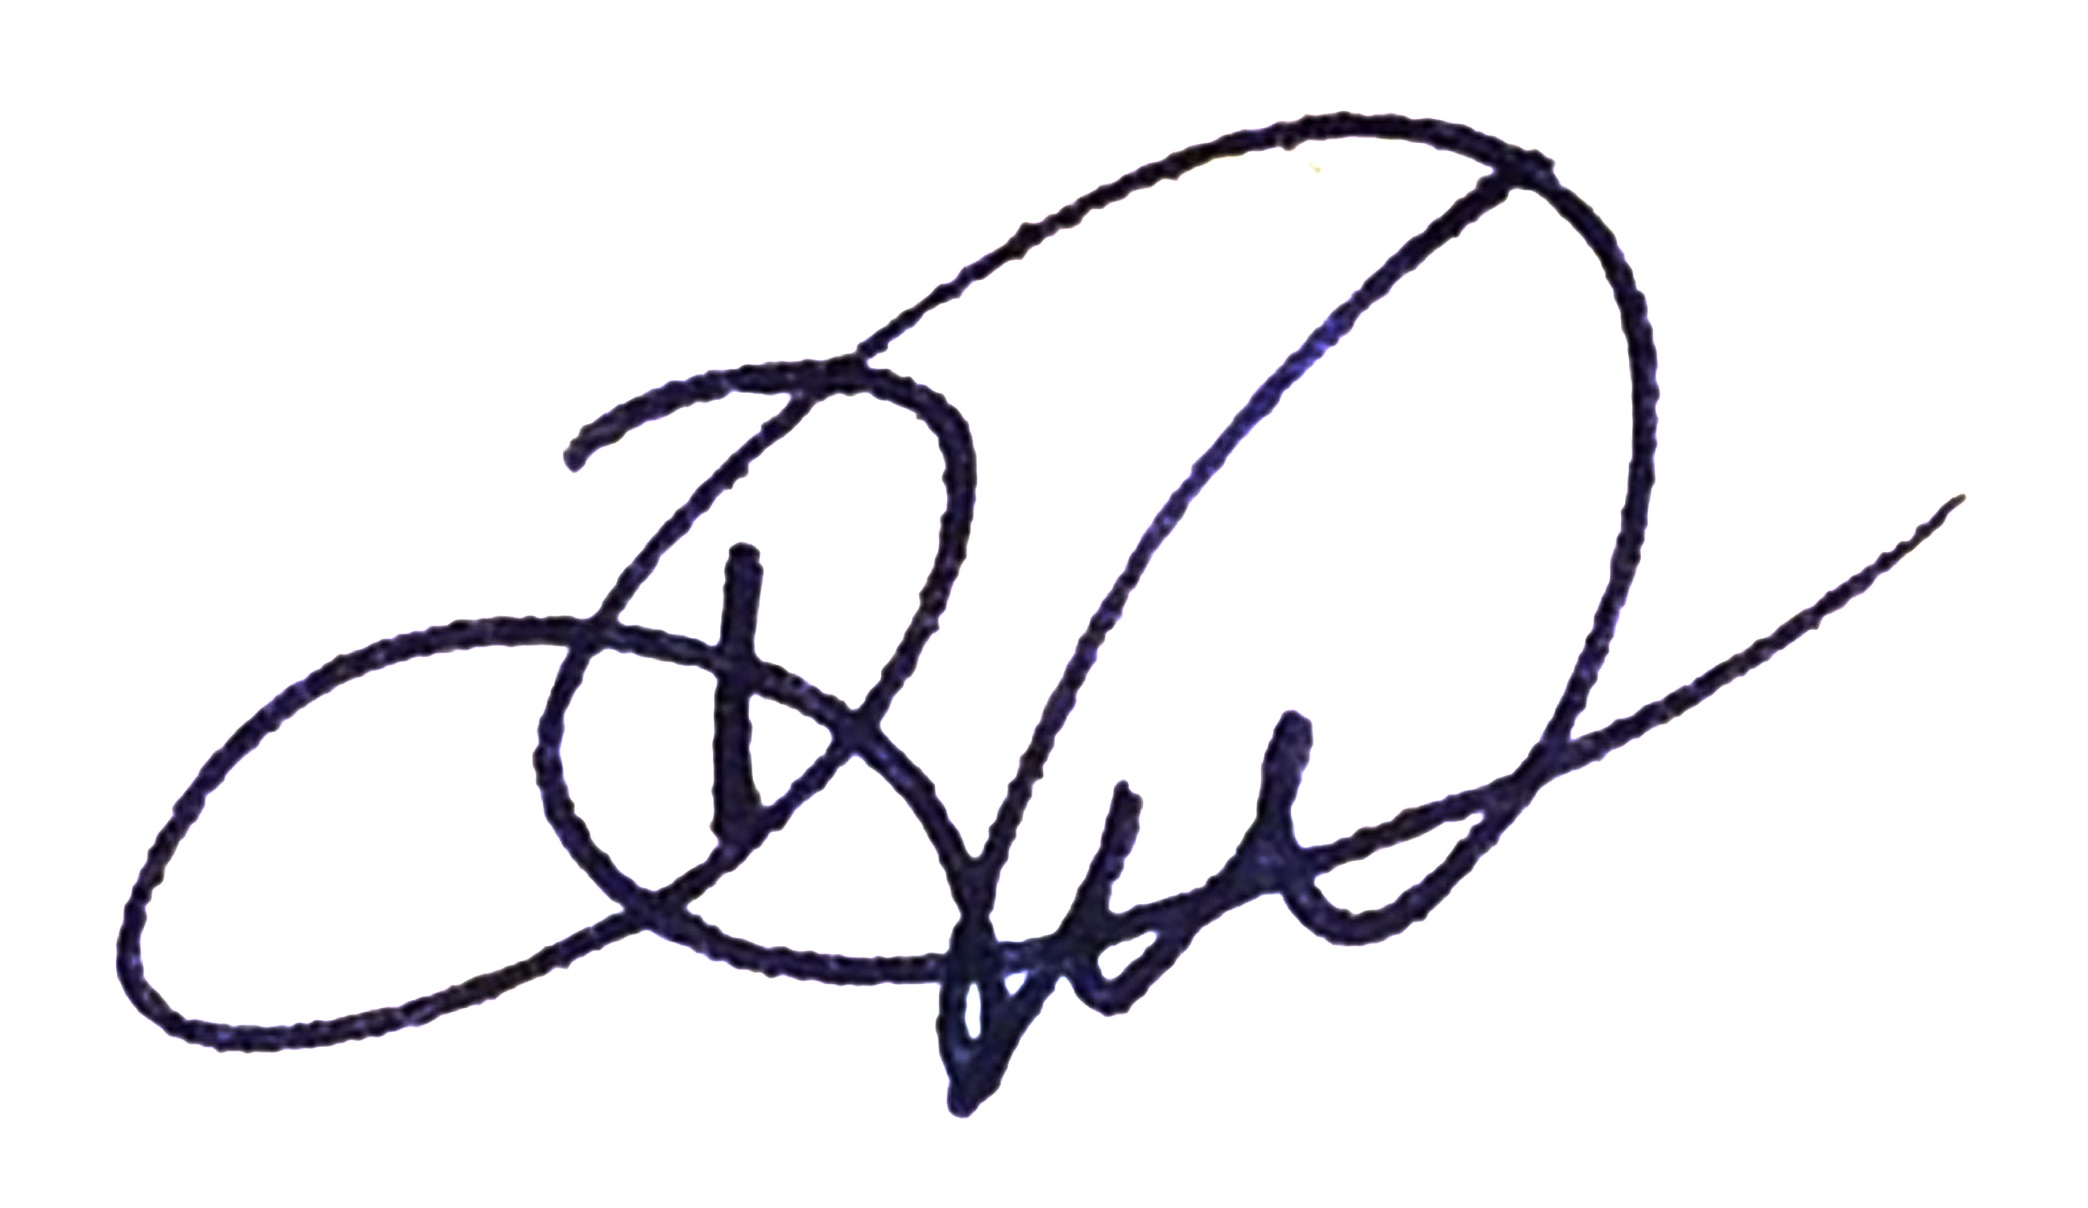 d. vieth art's Signature